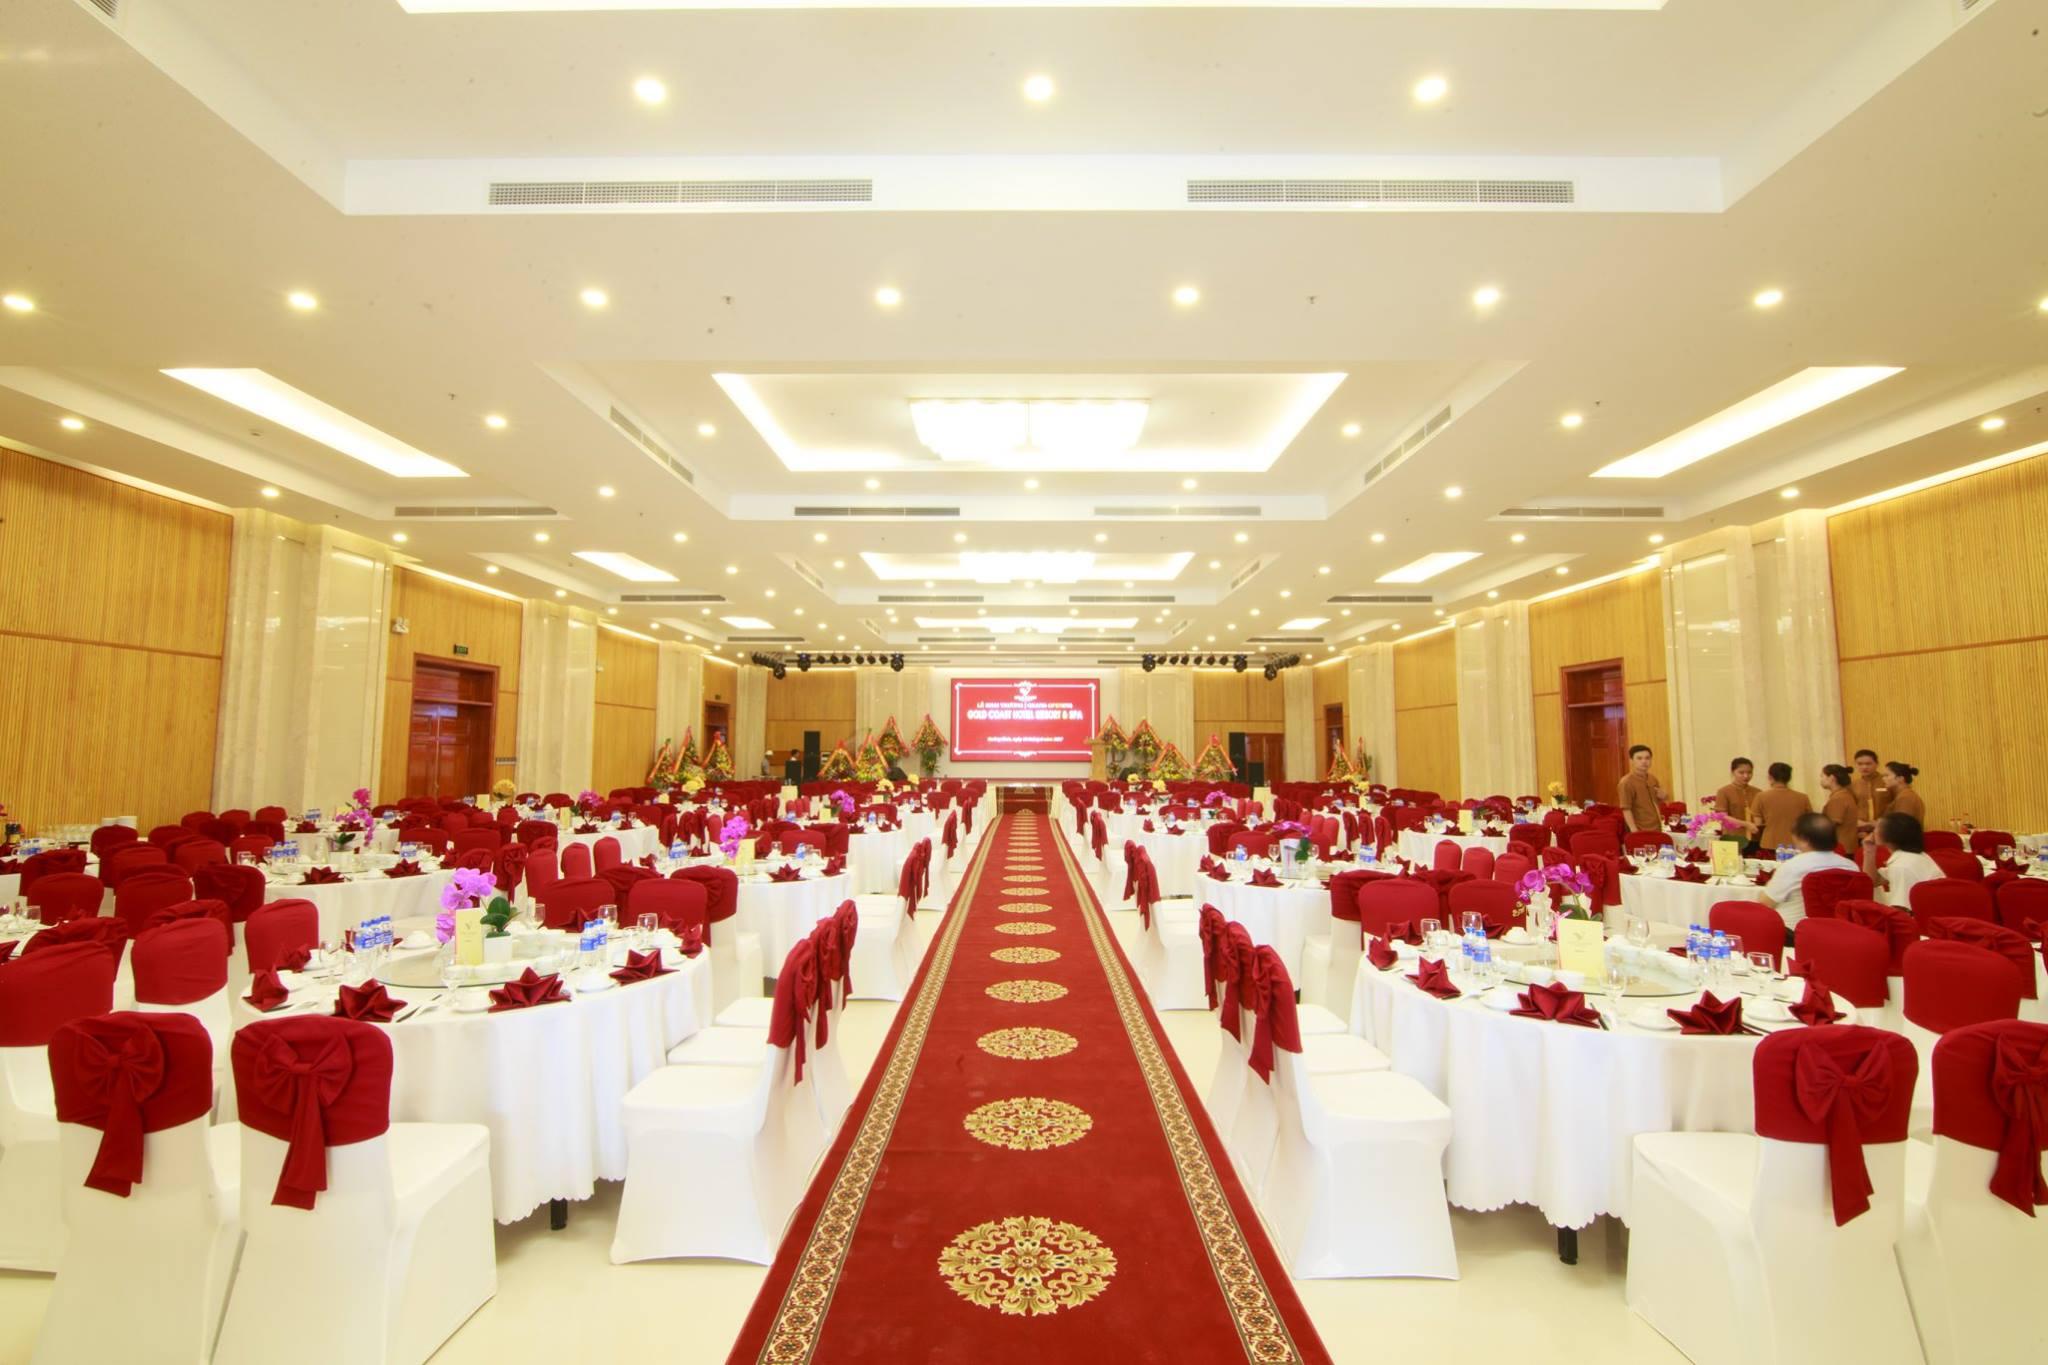 Phòng họp, hội nghị tại Gold Coast Hotel Resort & Spa